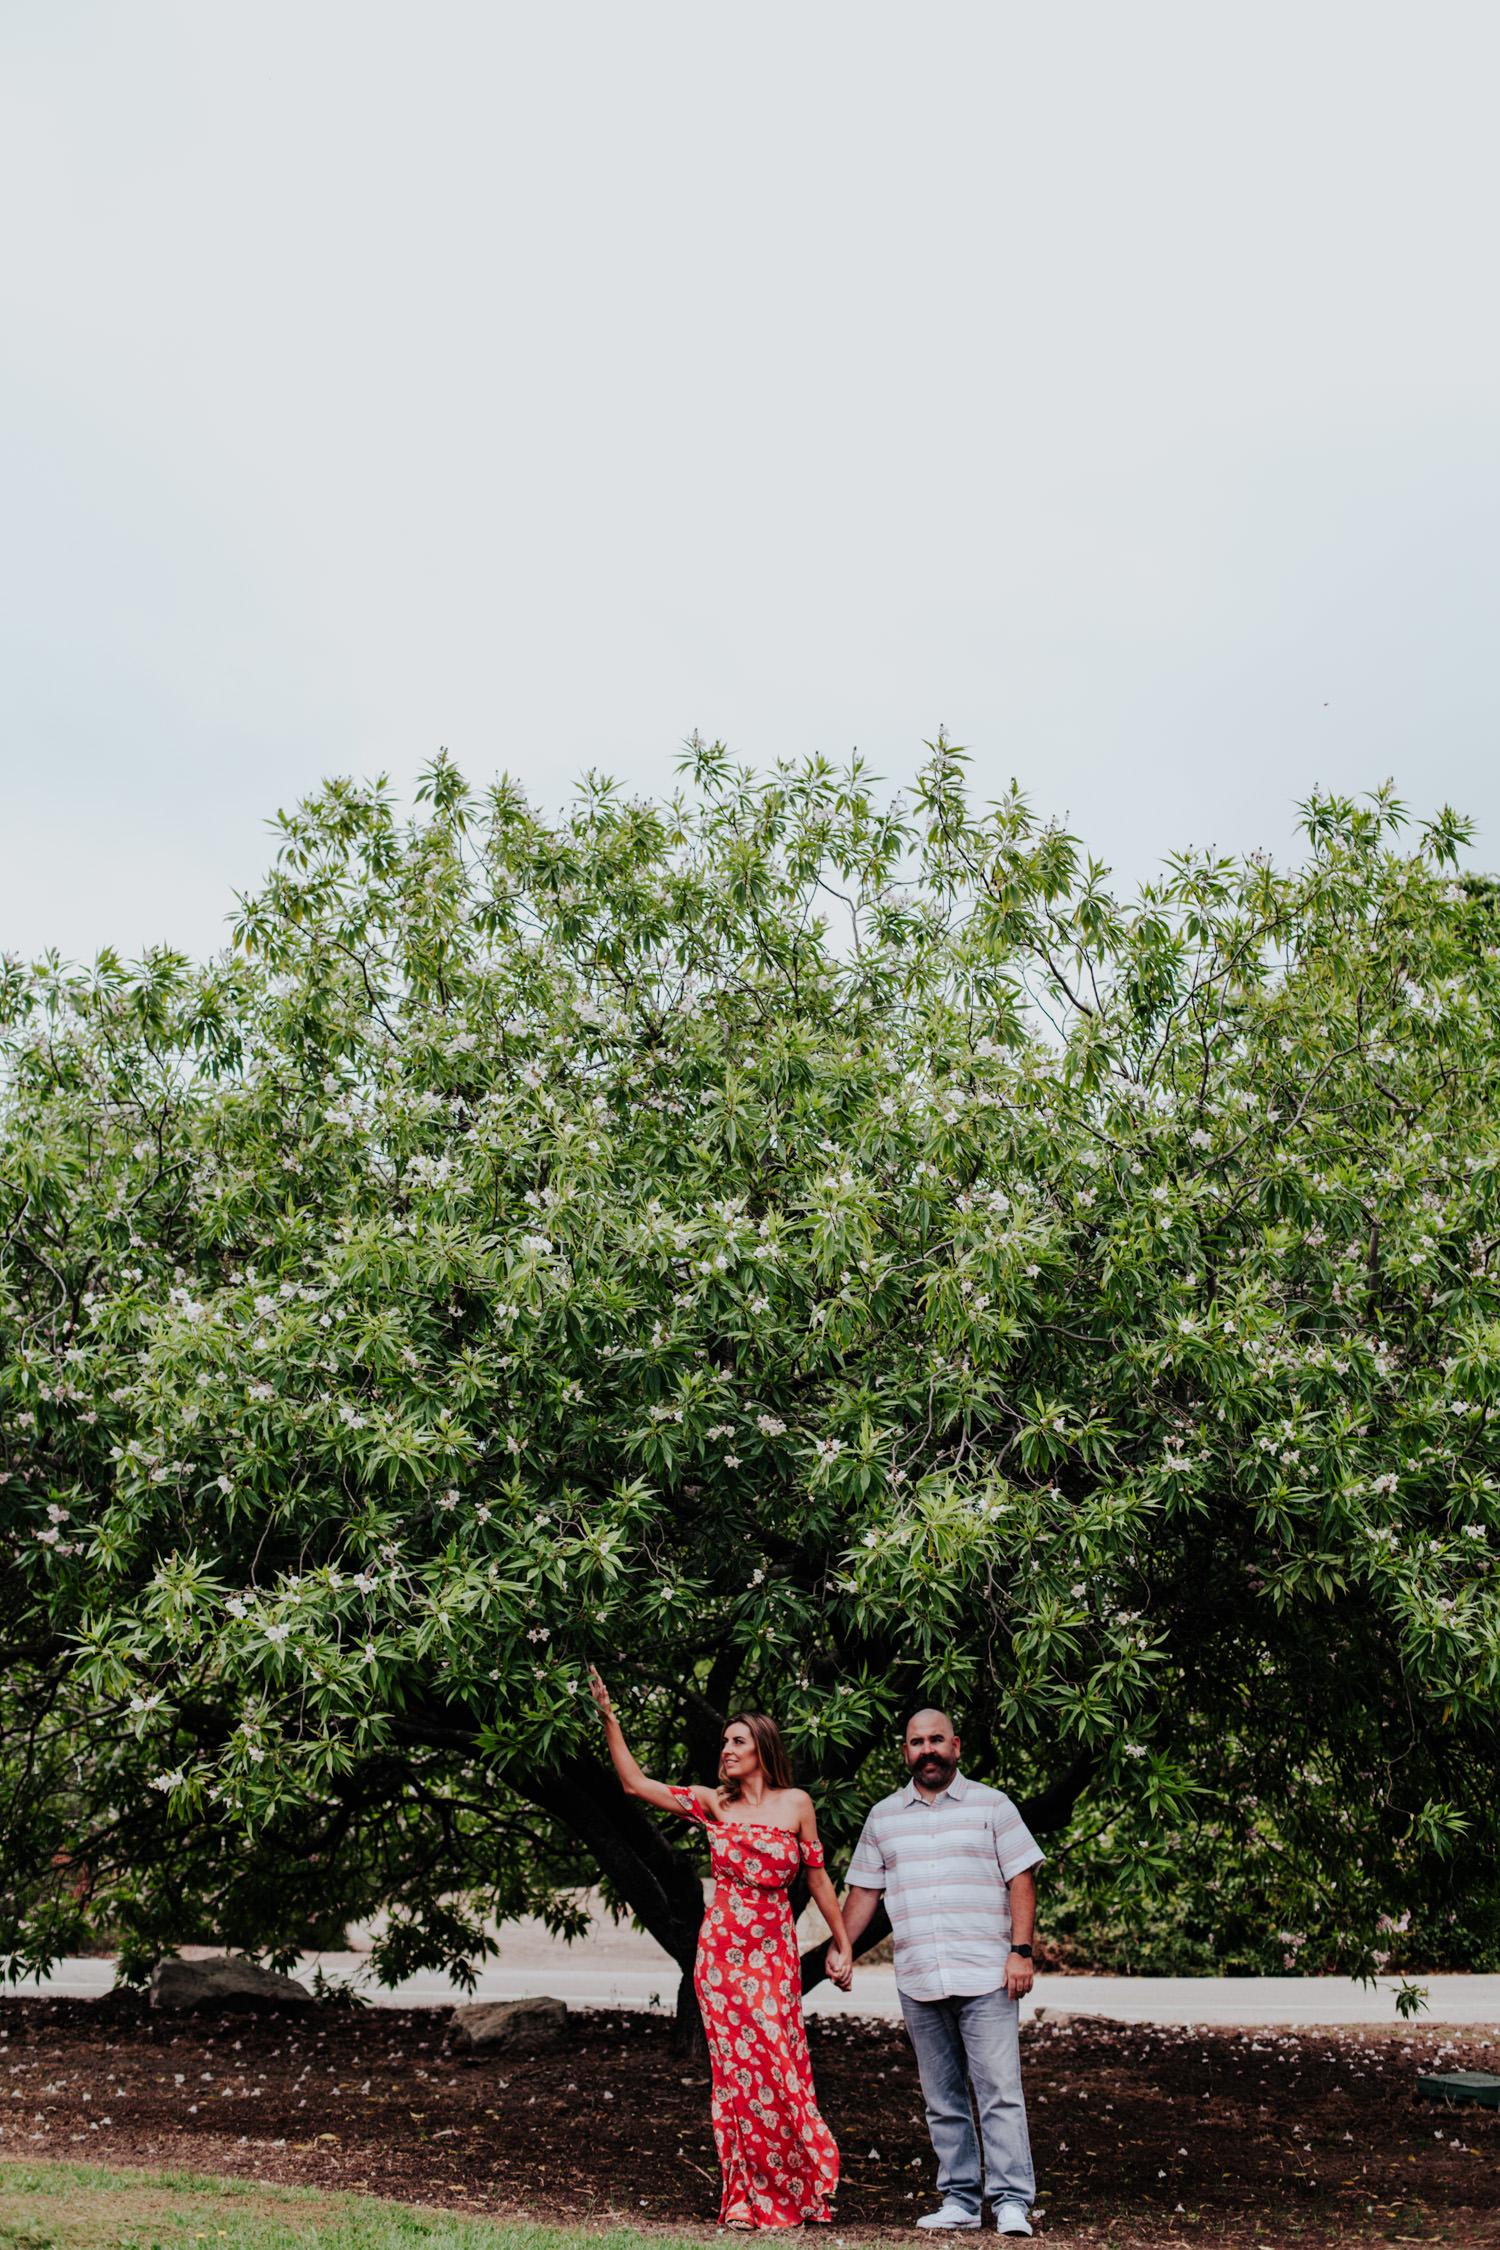 terranea-resort-palos-verdes-california-wedding-photography-cove-los-angeles-pierce-77.jpg